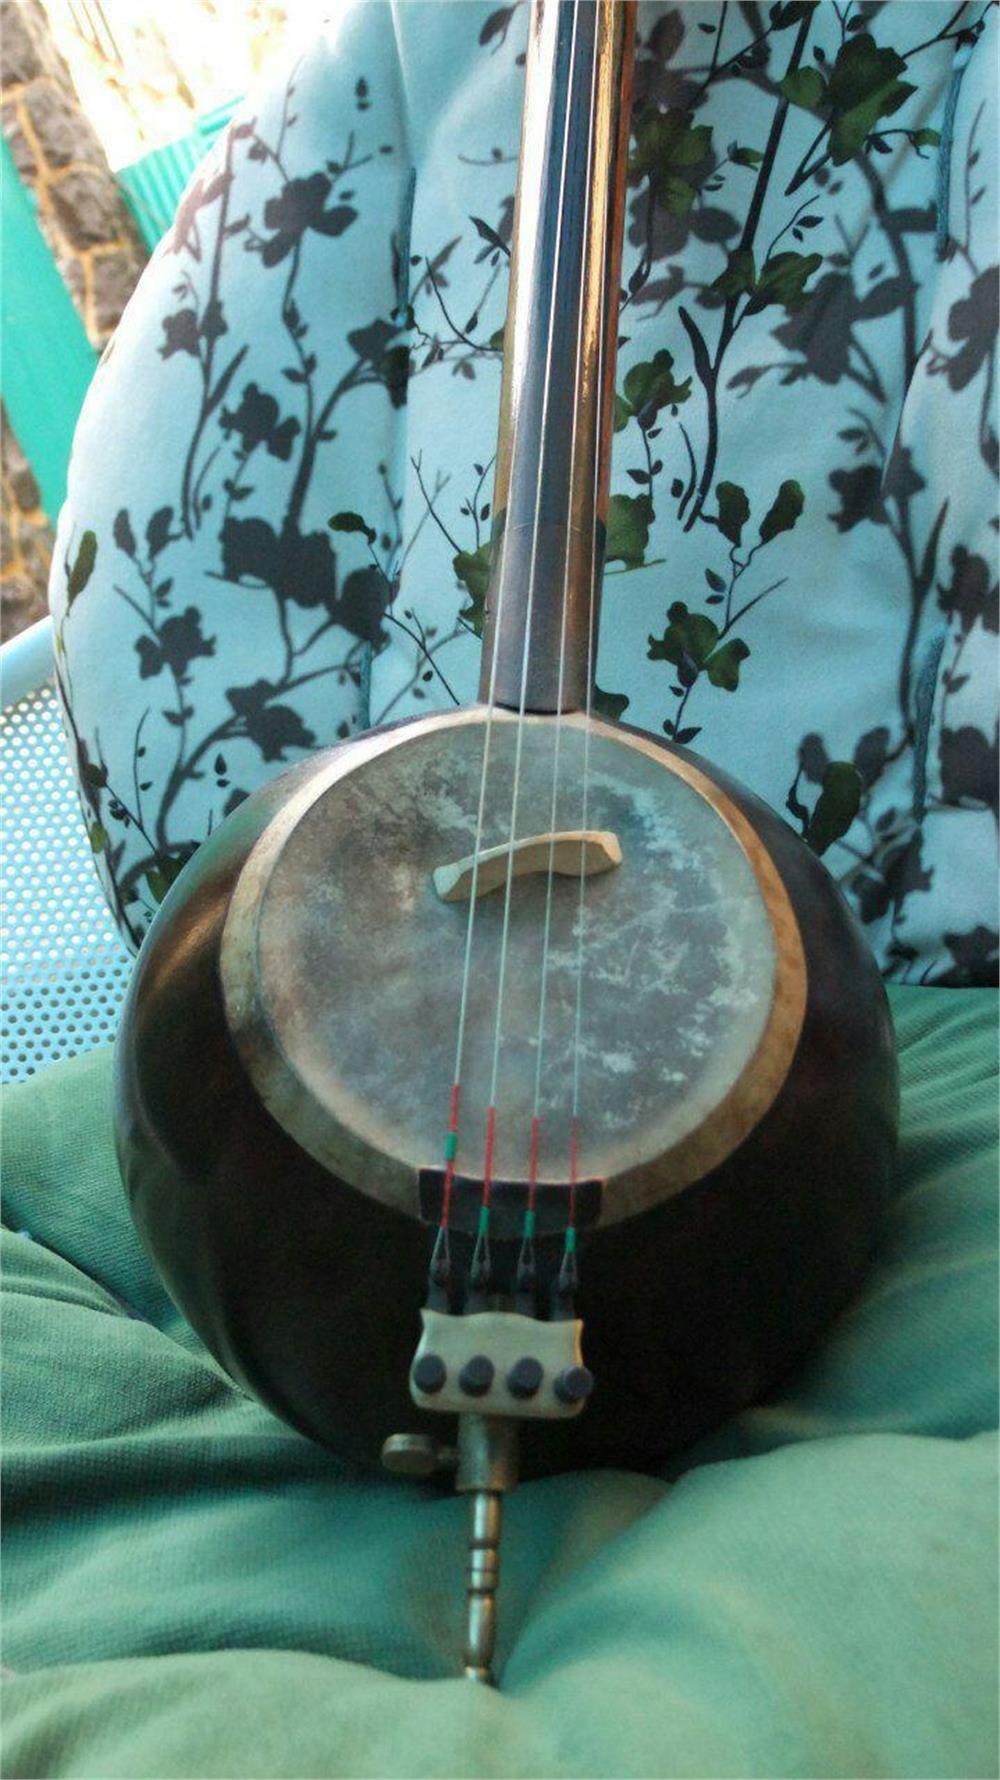 تصویر کمانچه ا Fiddle Fiddle